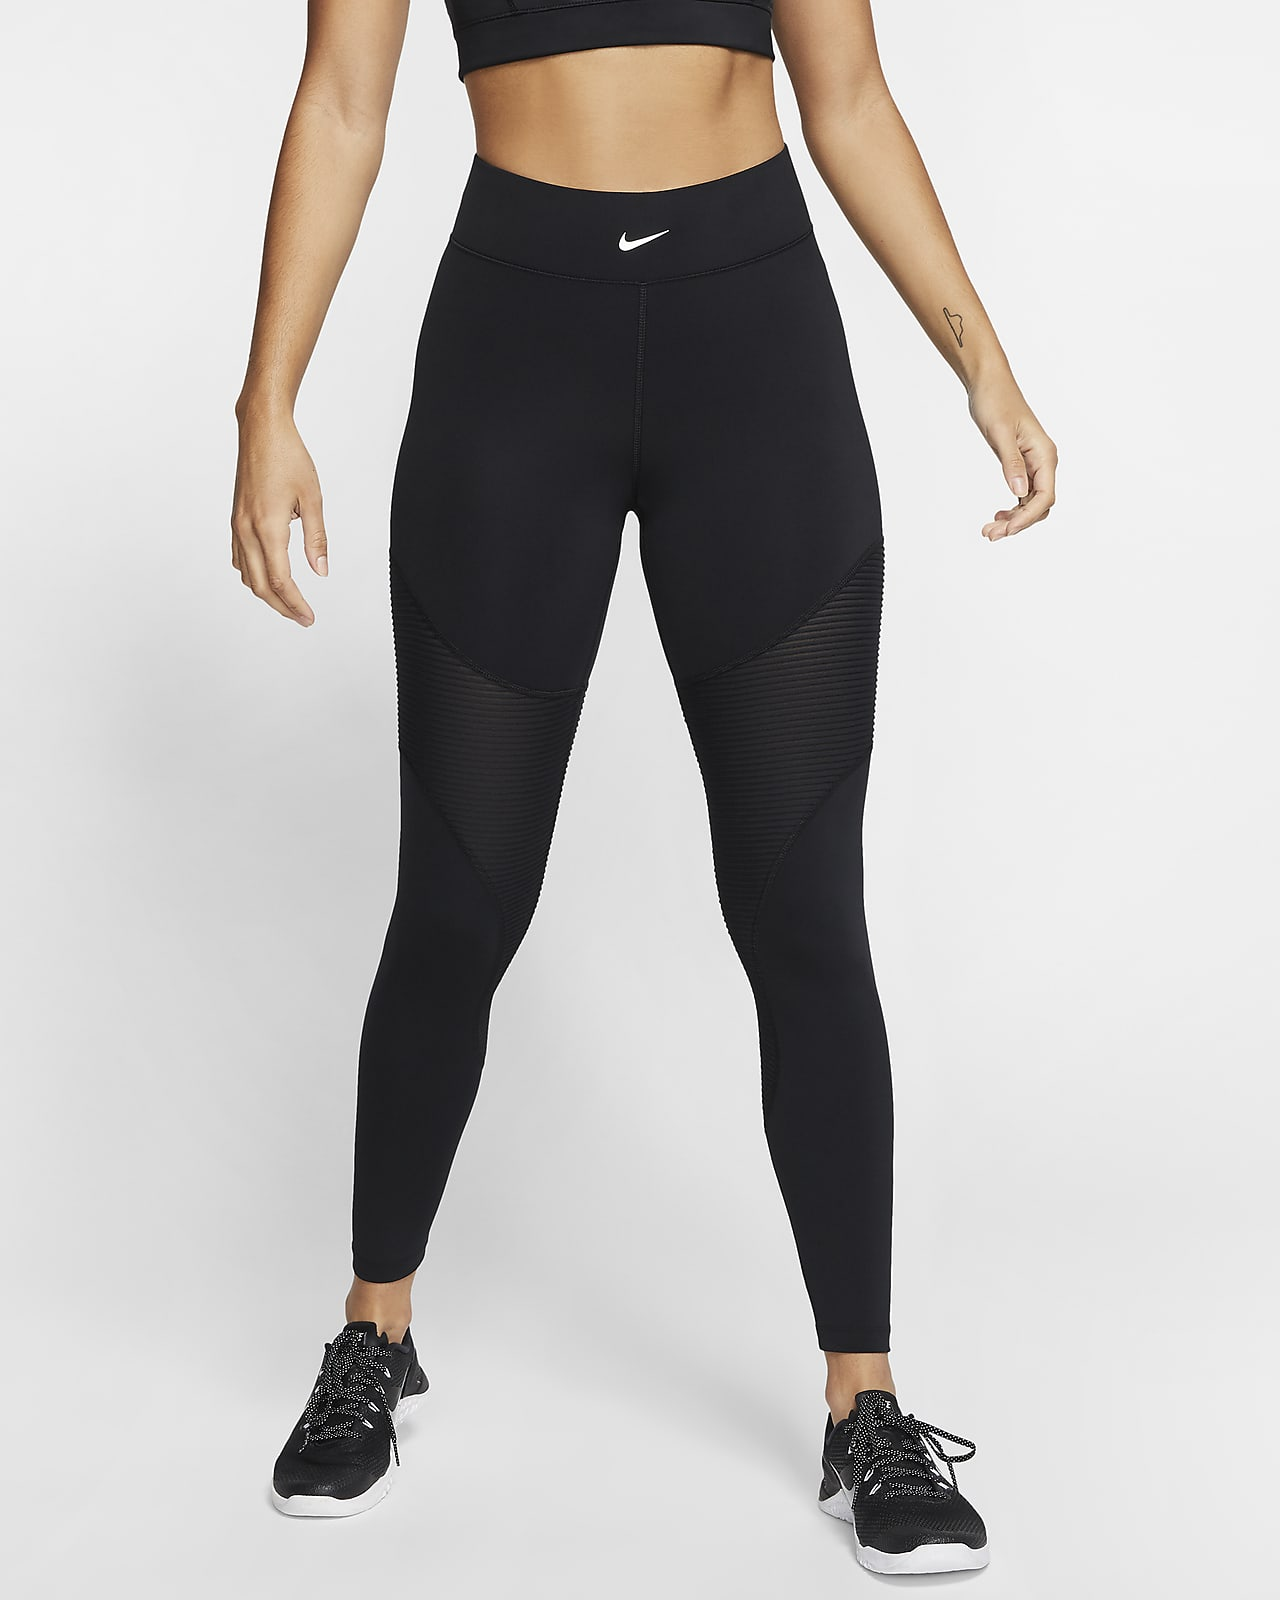 Nike Pro AeroAdapt Malles - Dona